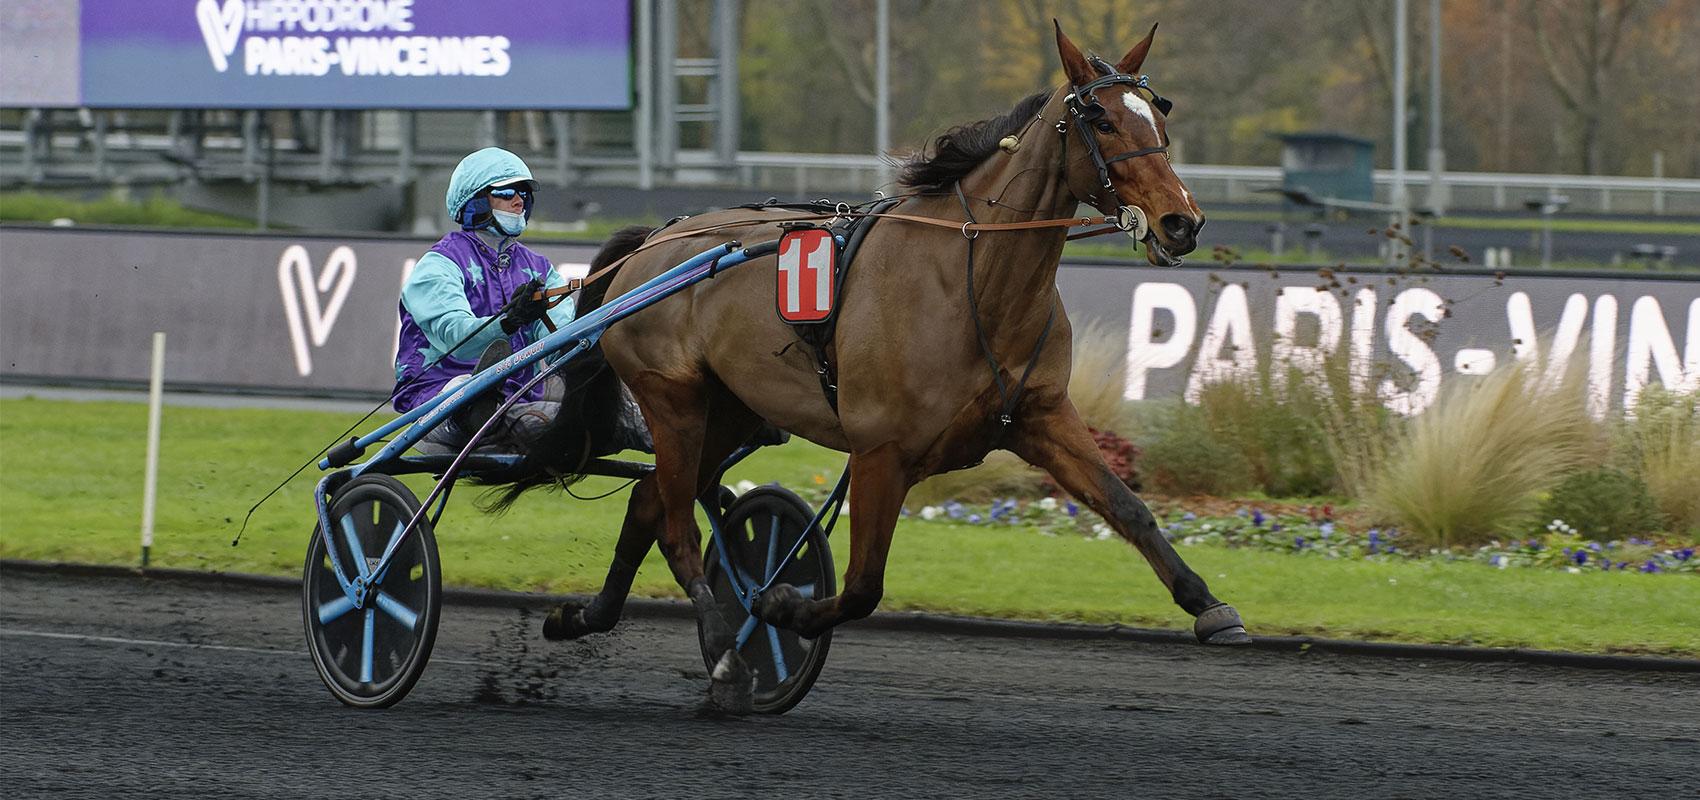 Prix d'Amérique Races ZEturf QUALIF #3 and #4: the likely starters